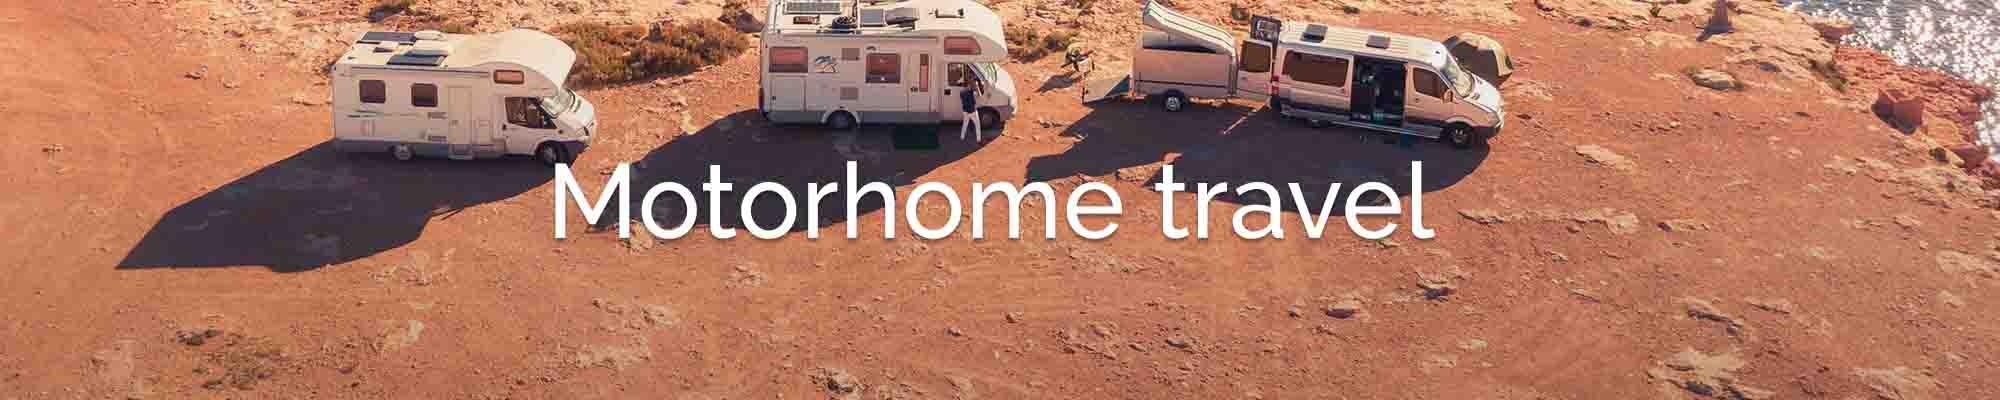 motorhome travel